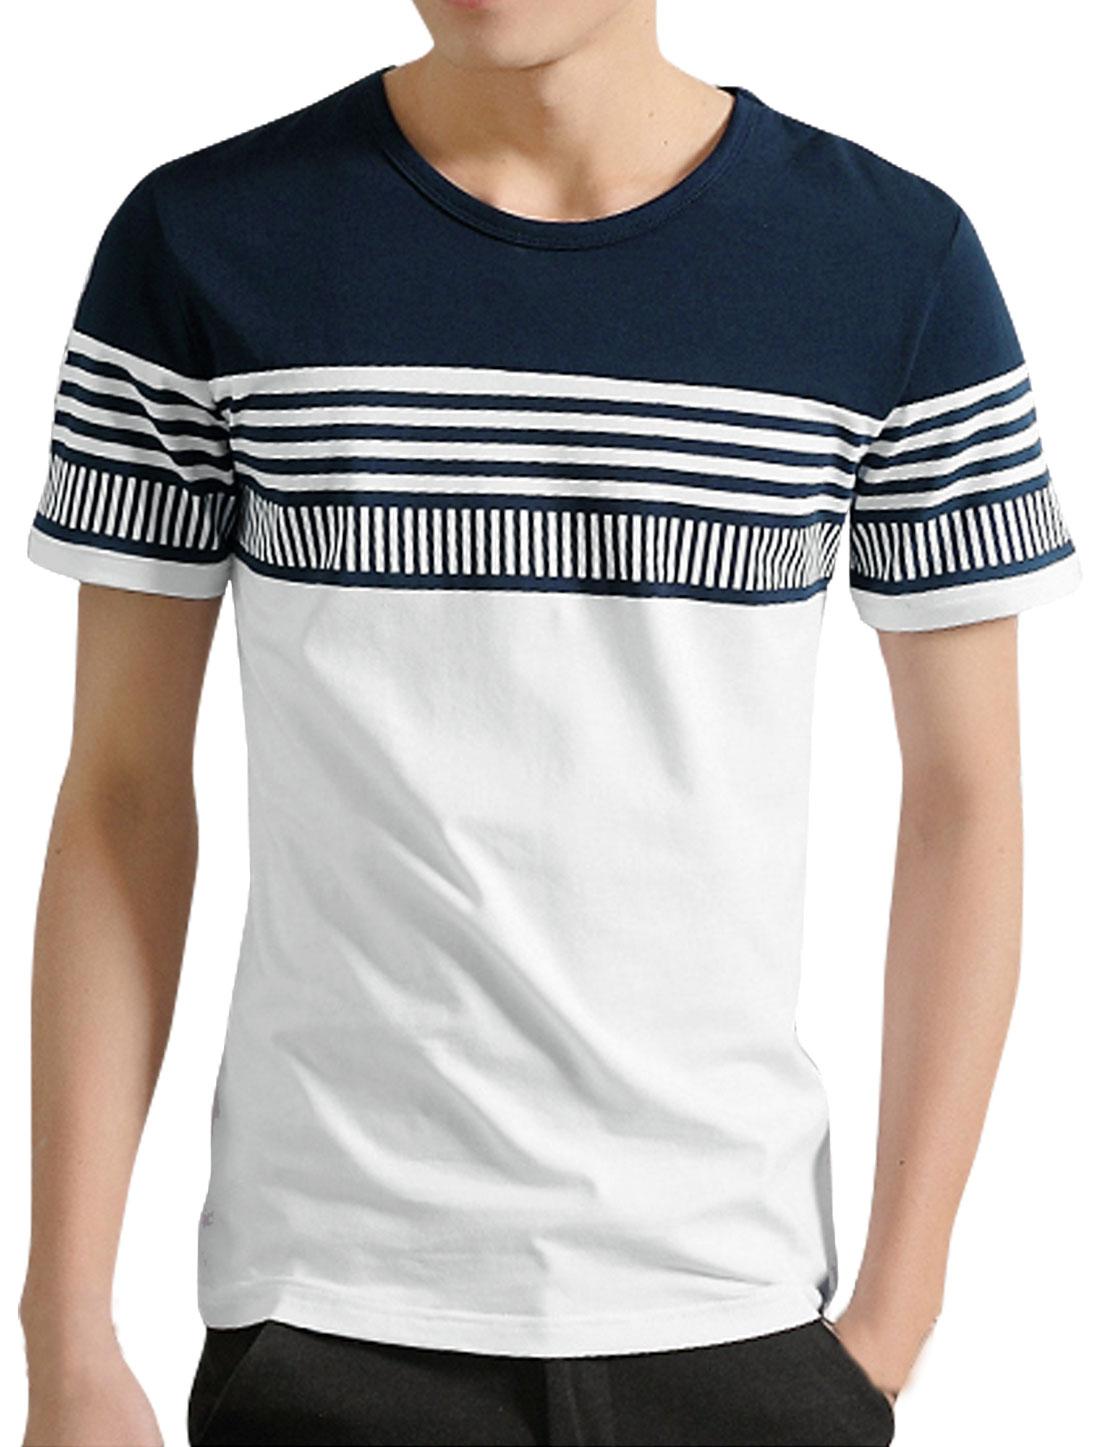 Men Crew Neck Short Sleeves Stripes Slim Fit Tee White M